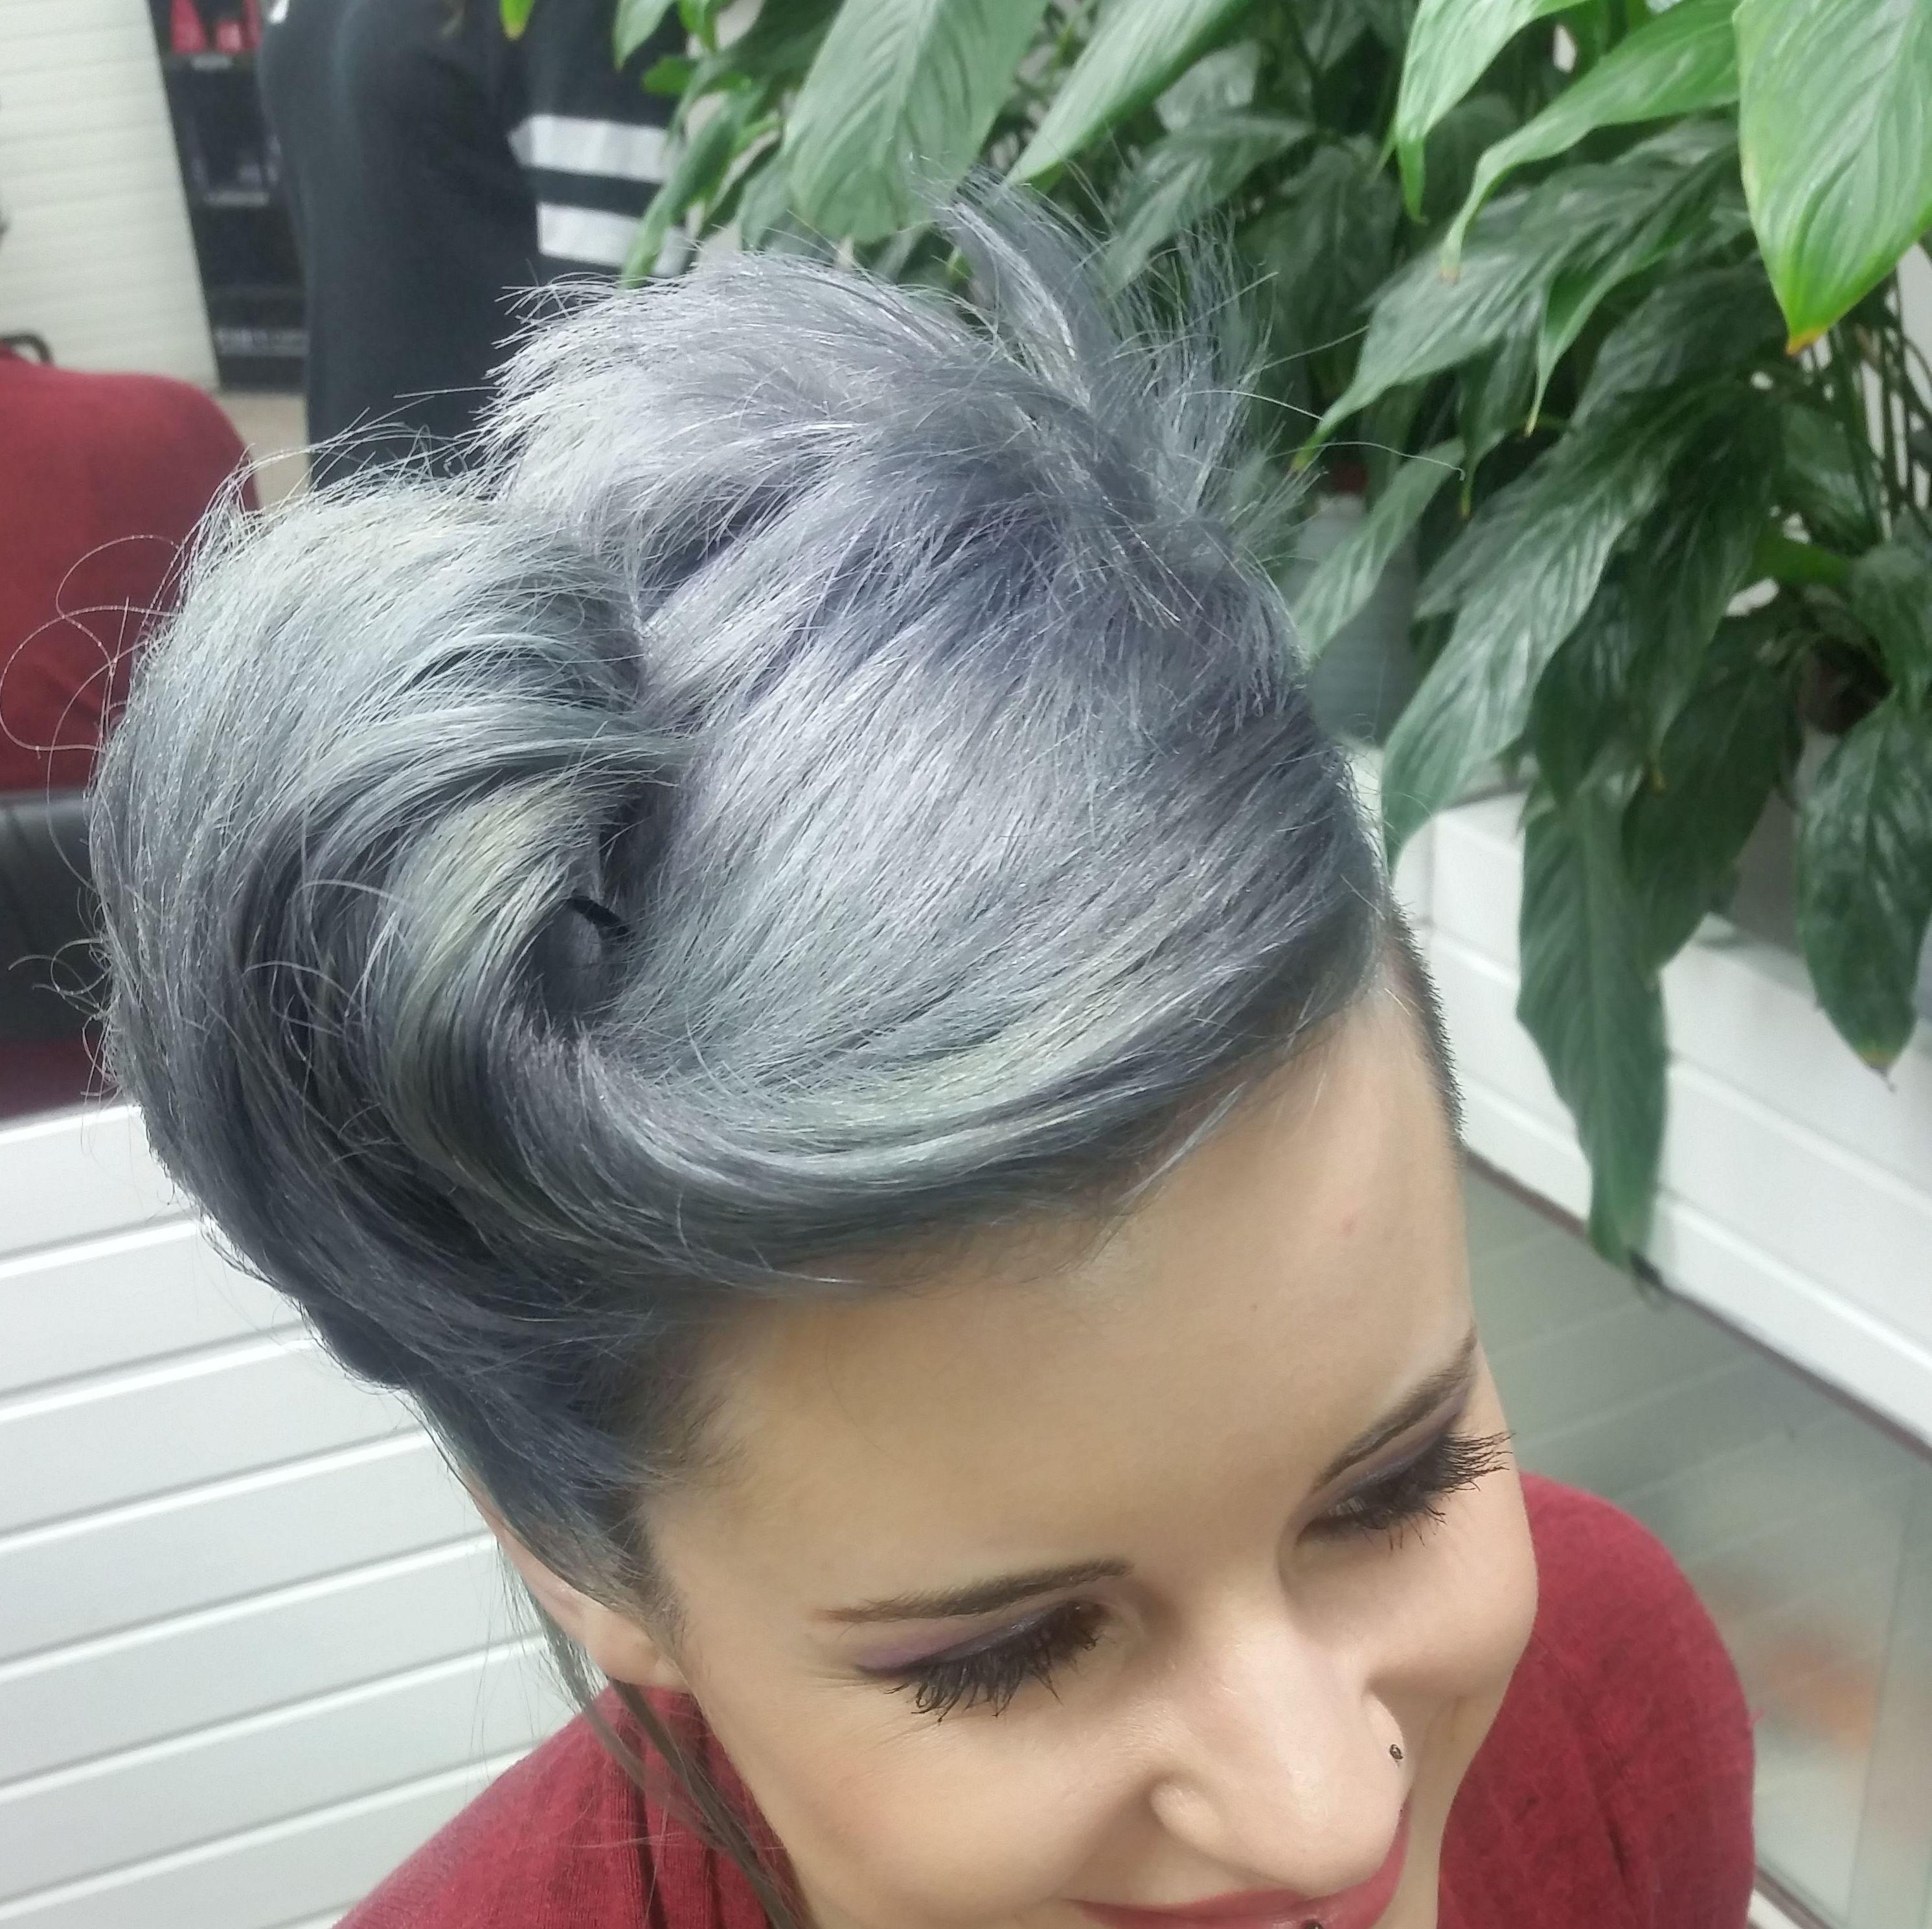 grises con recojido pinap